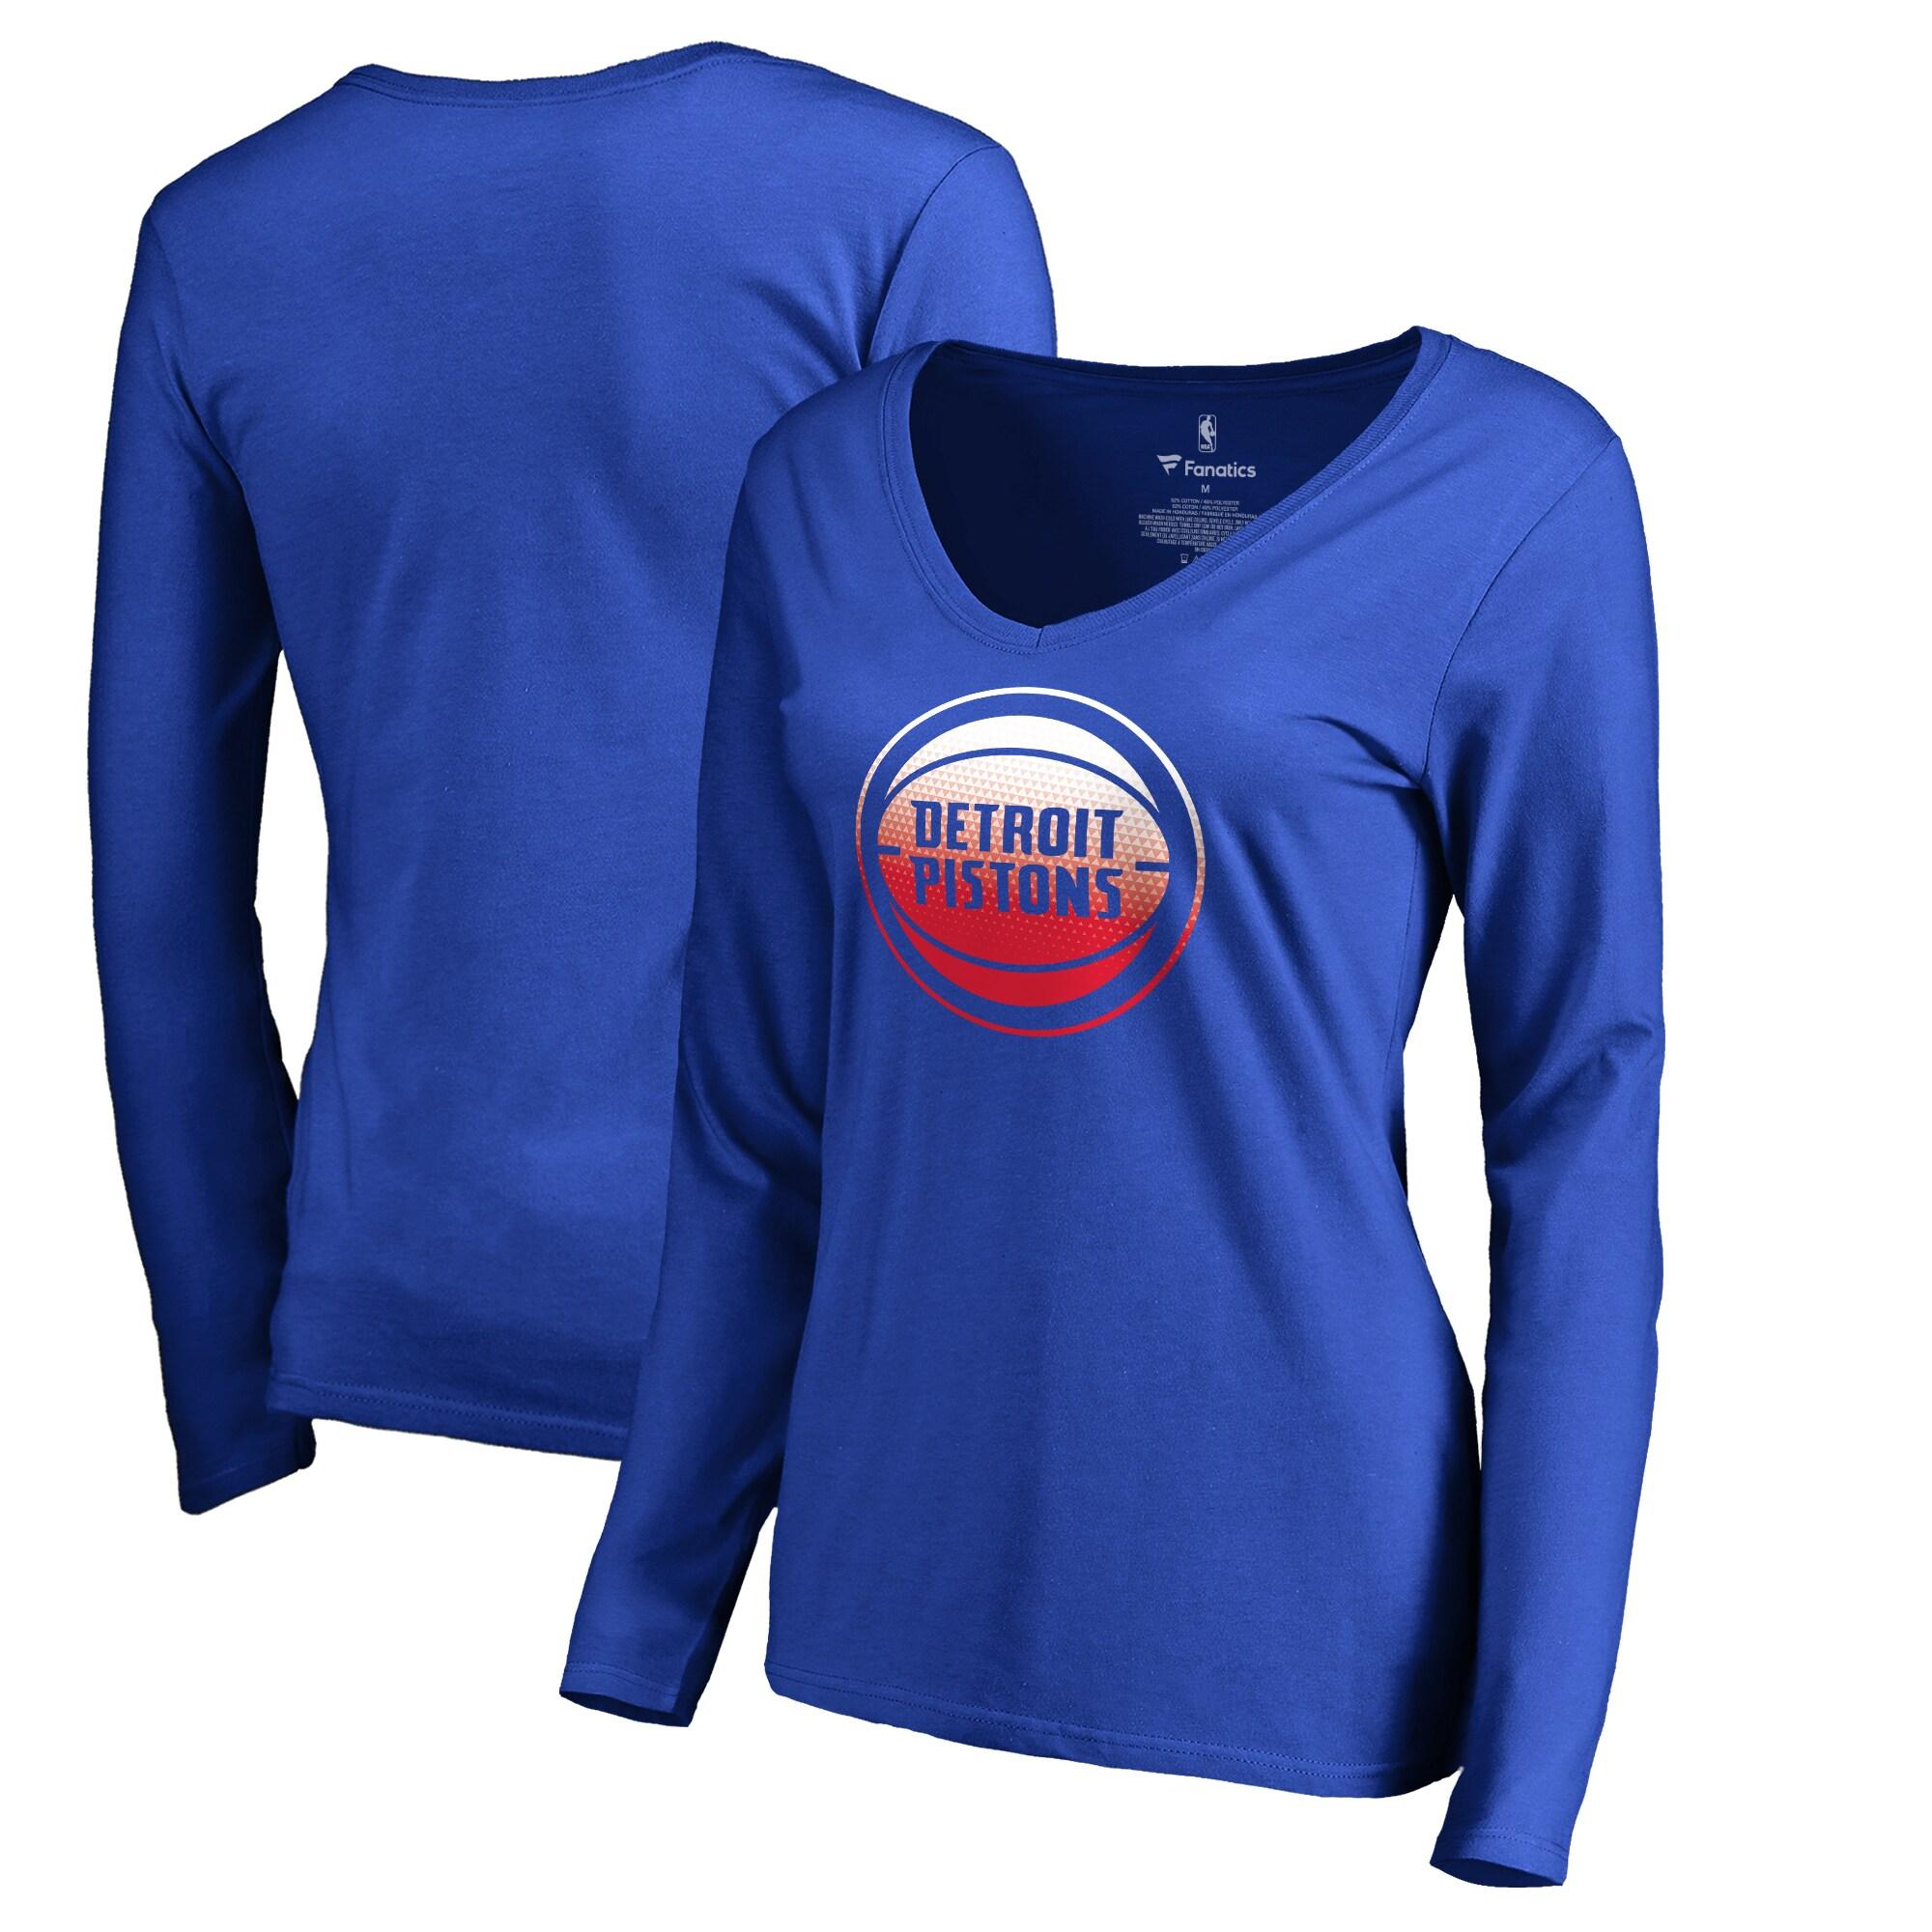 Detroit Pistons Fanatics Branded Women's Plus Sizes Gradient Logo Long Sleeve T-Shirt - Royal